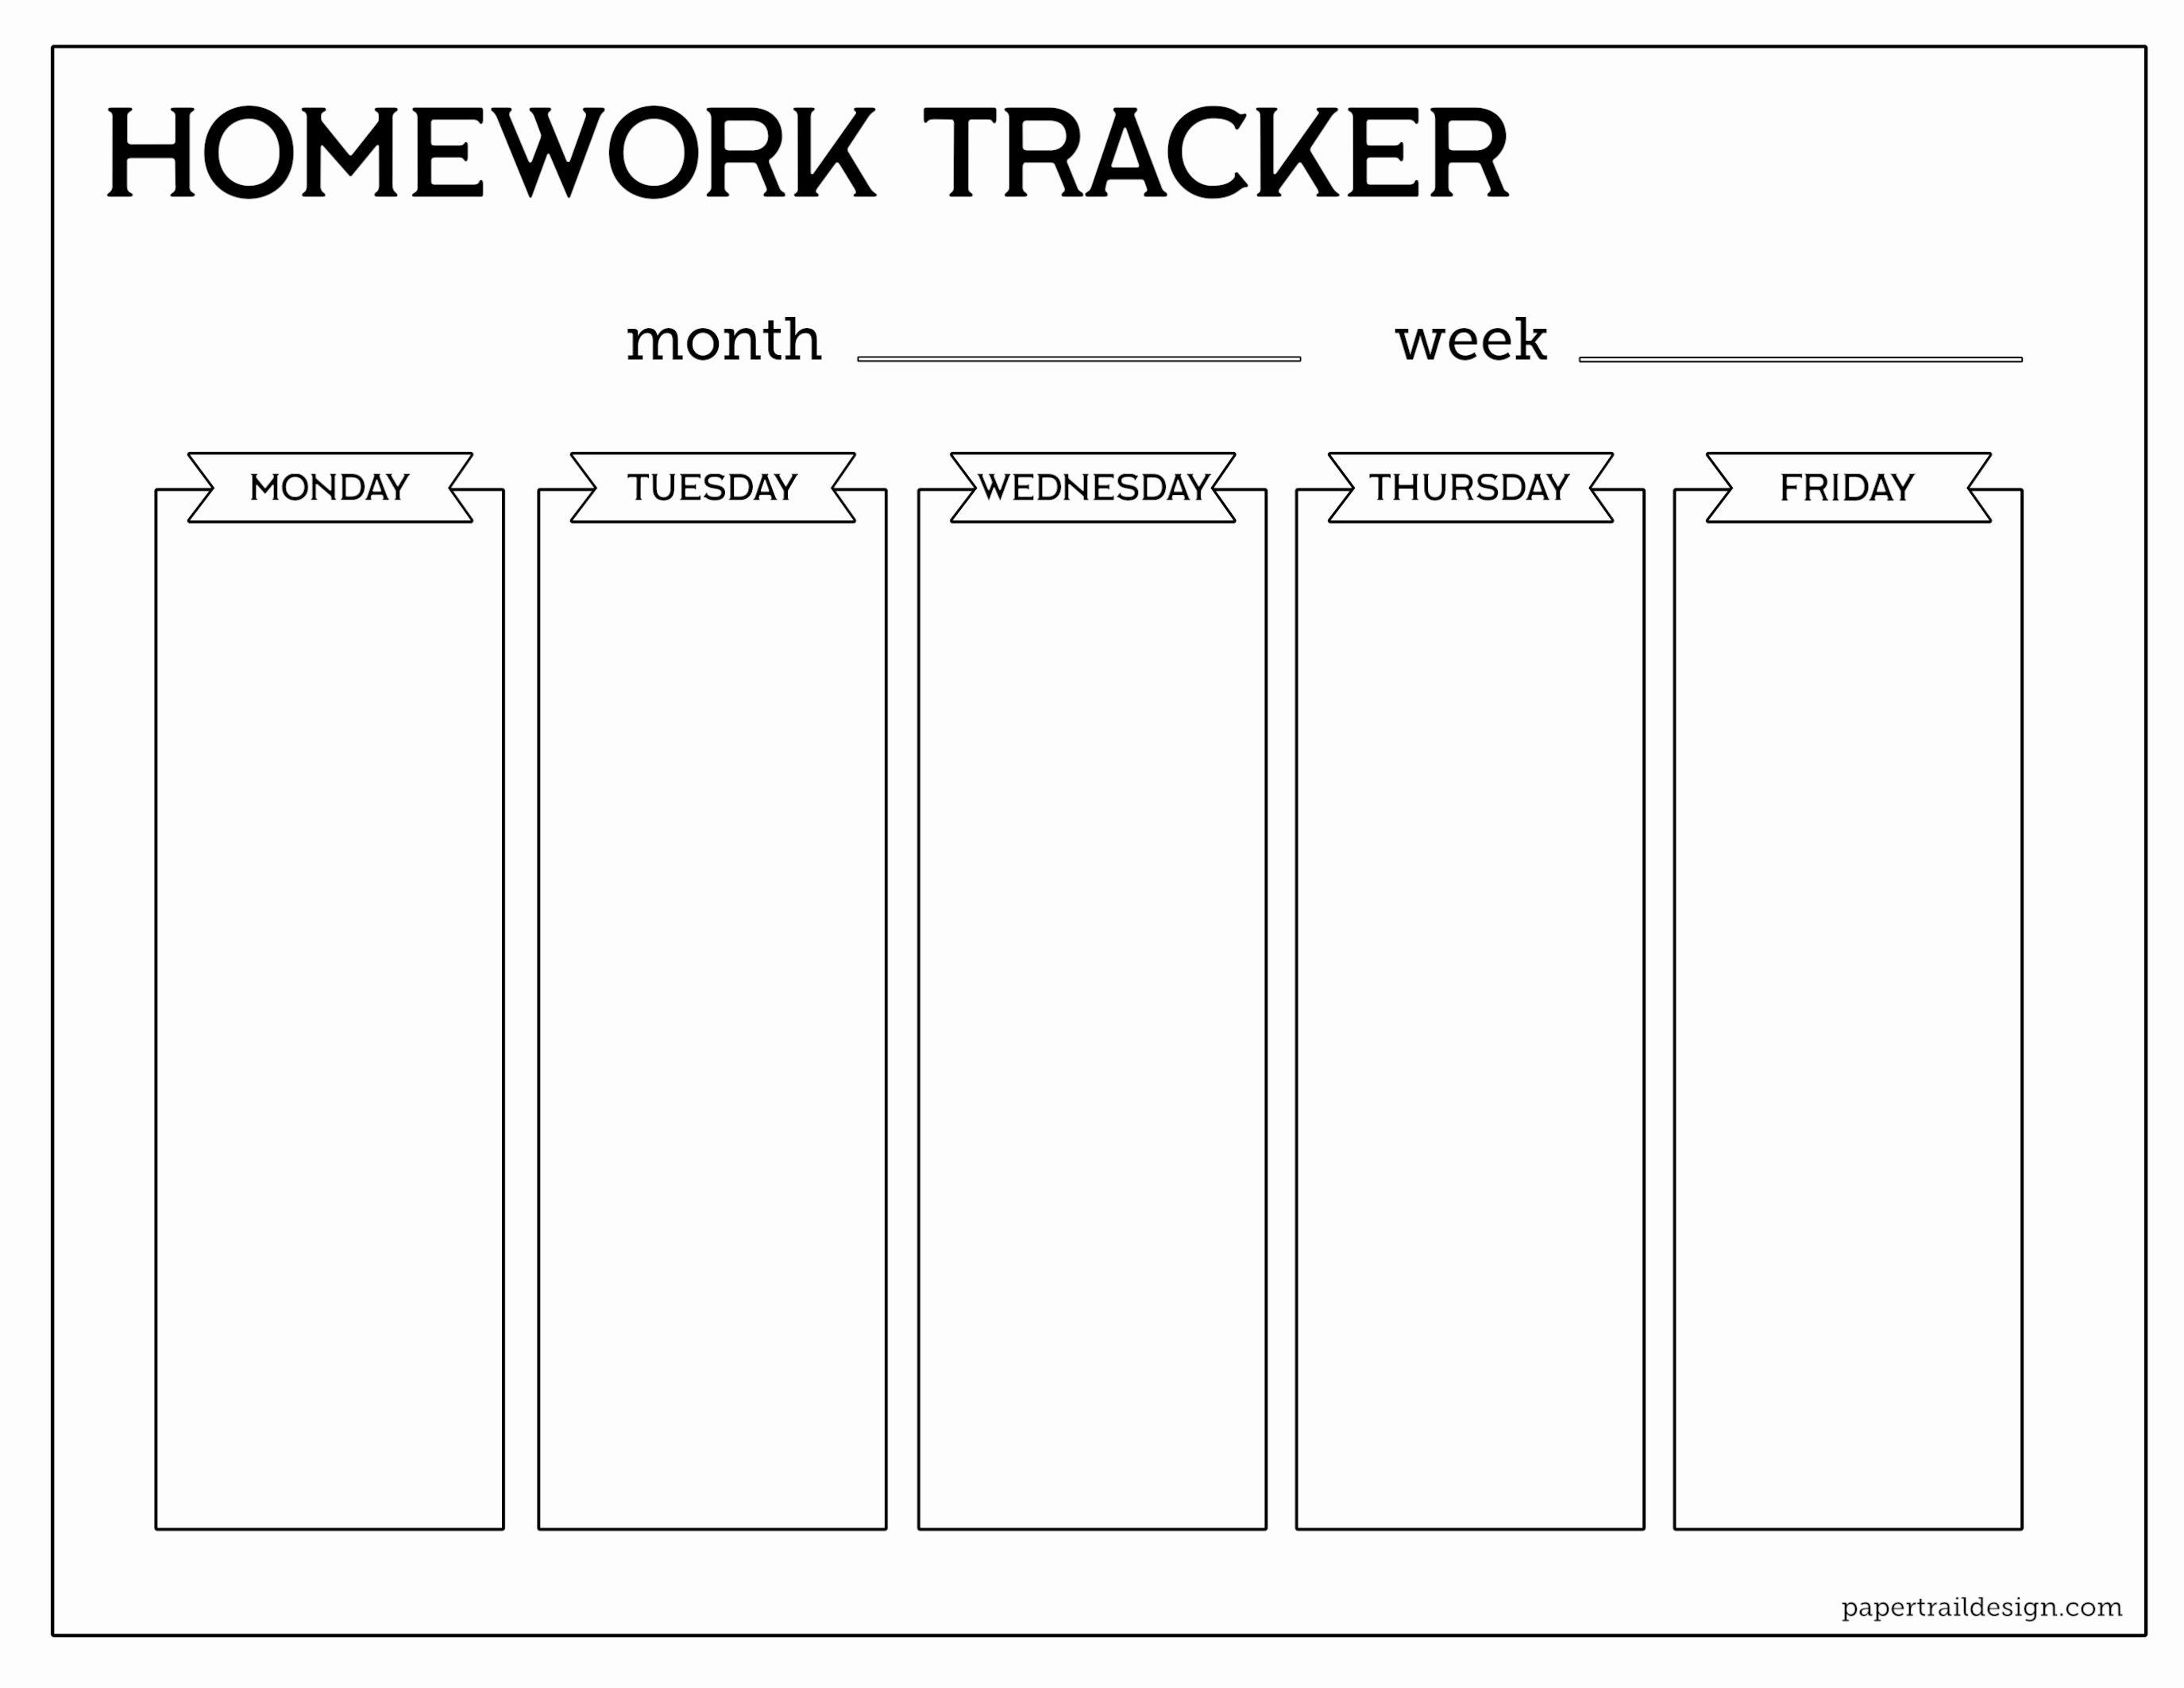 Free Printable Homework Planner New Free Printable Student Homework Planner Template Paper